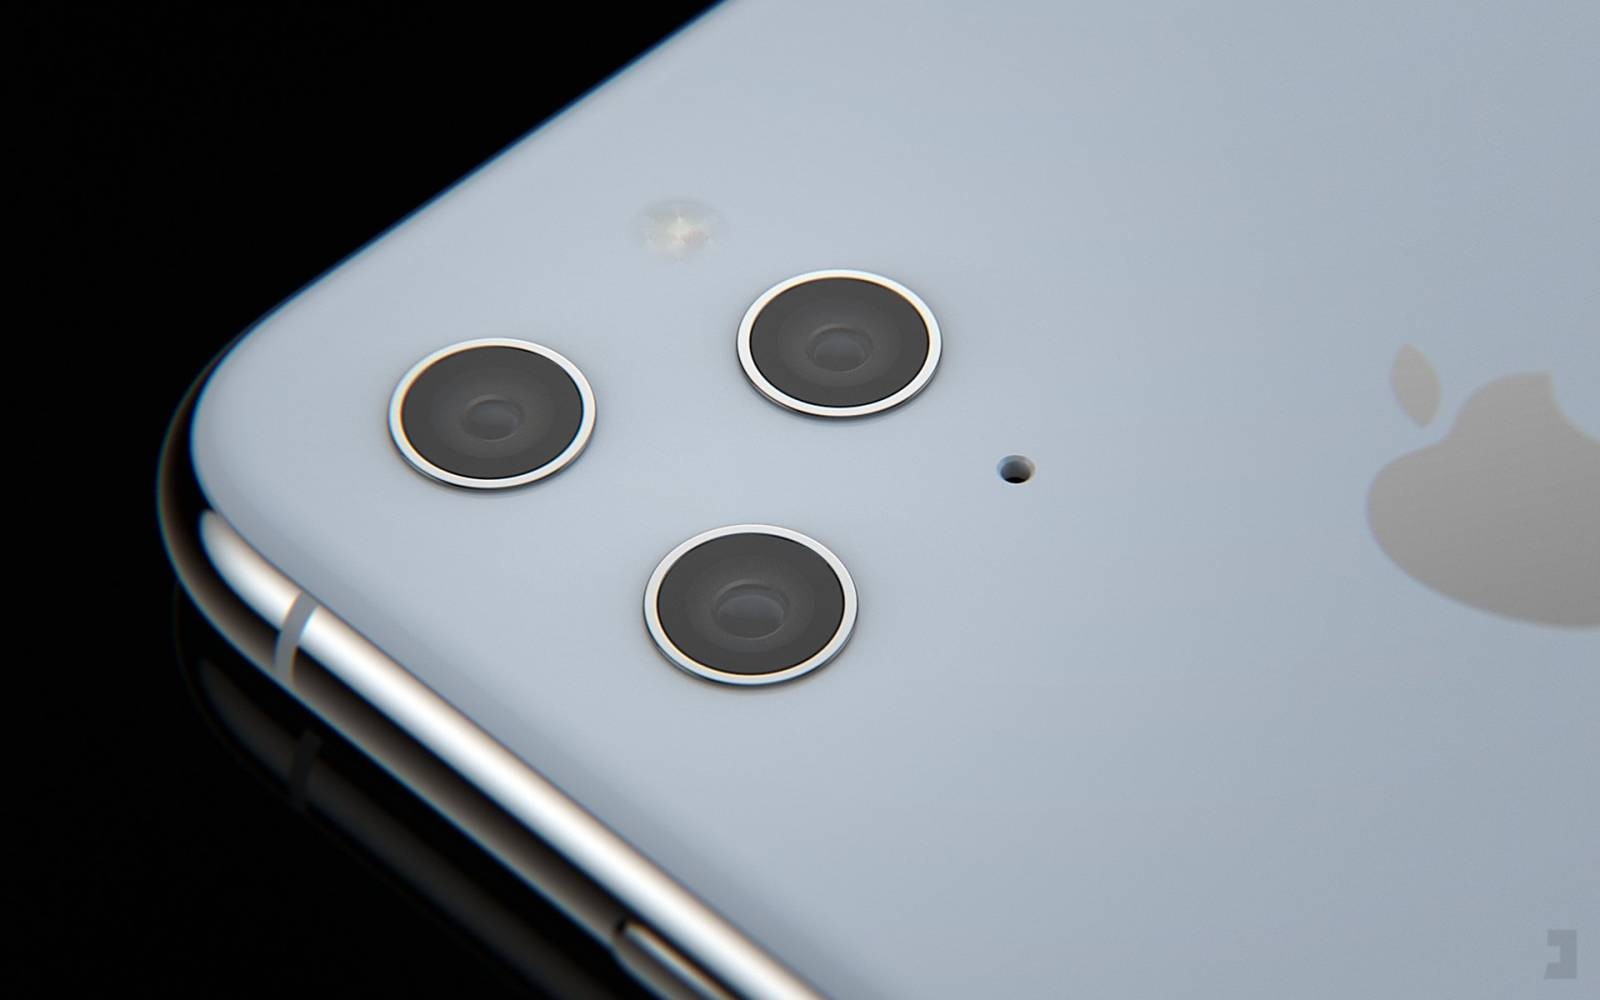 iPhone 11 night mode huawei p30 pro